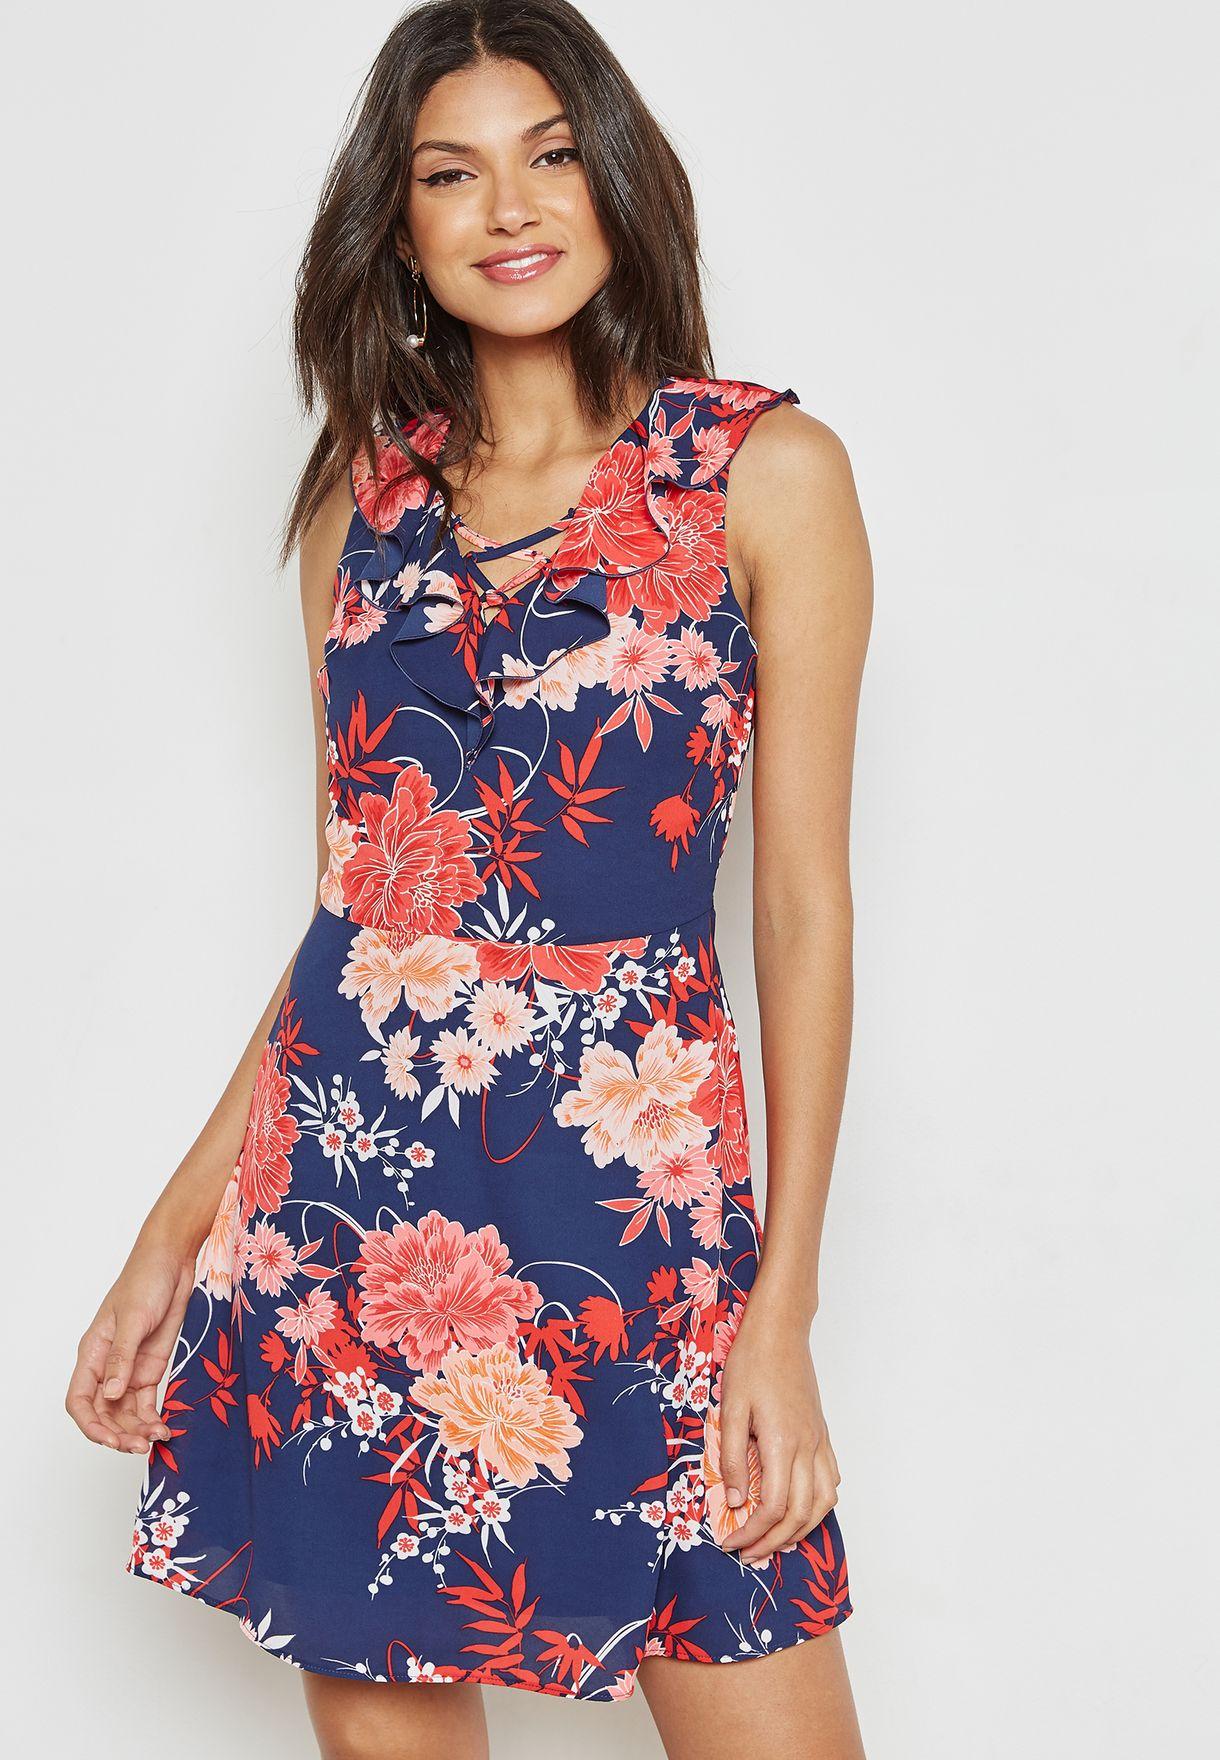 Floral Print Ruffle Skater Dress